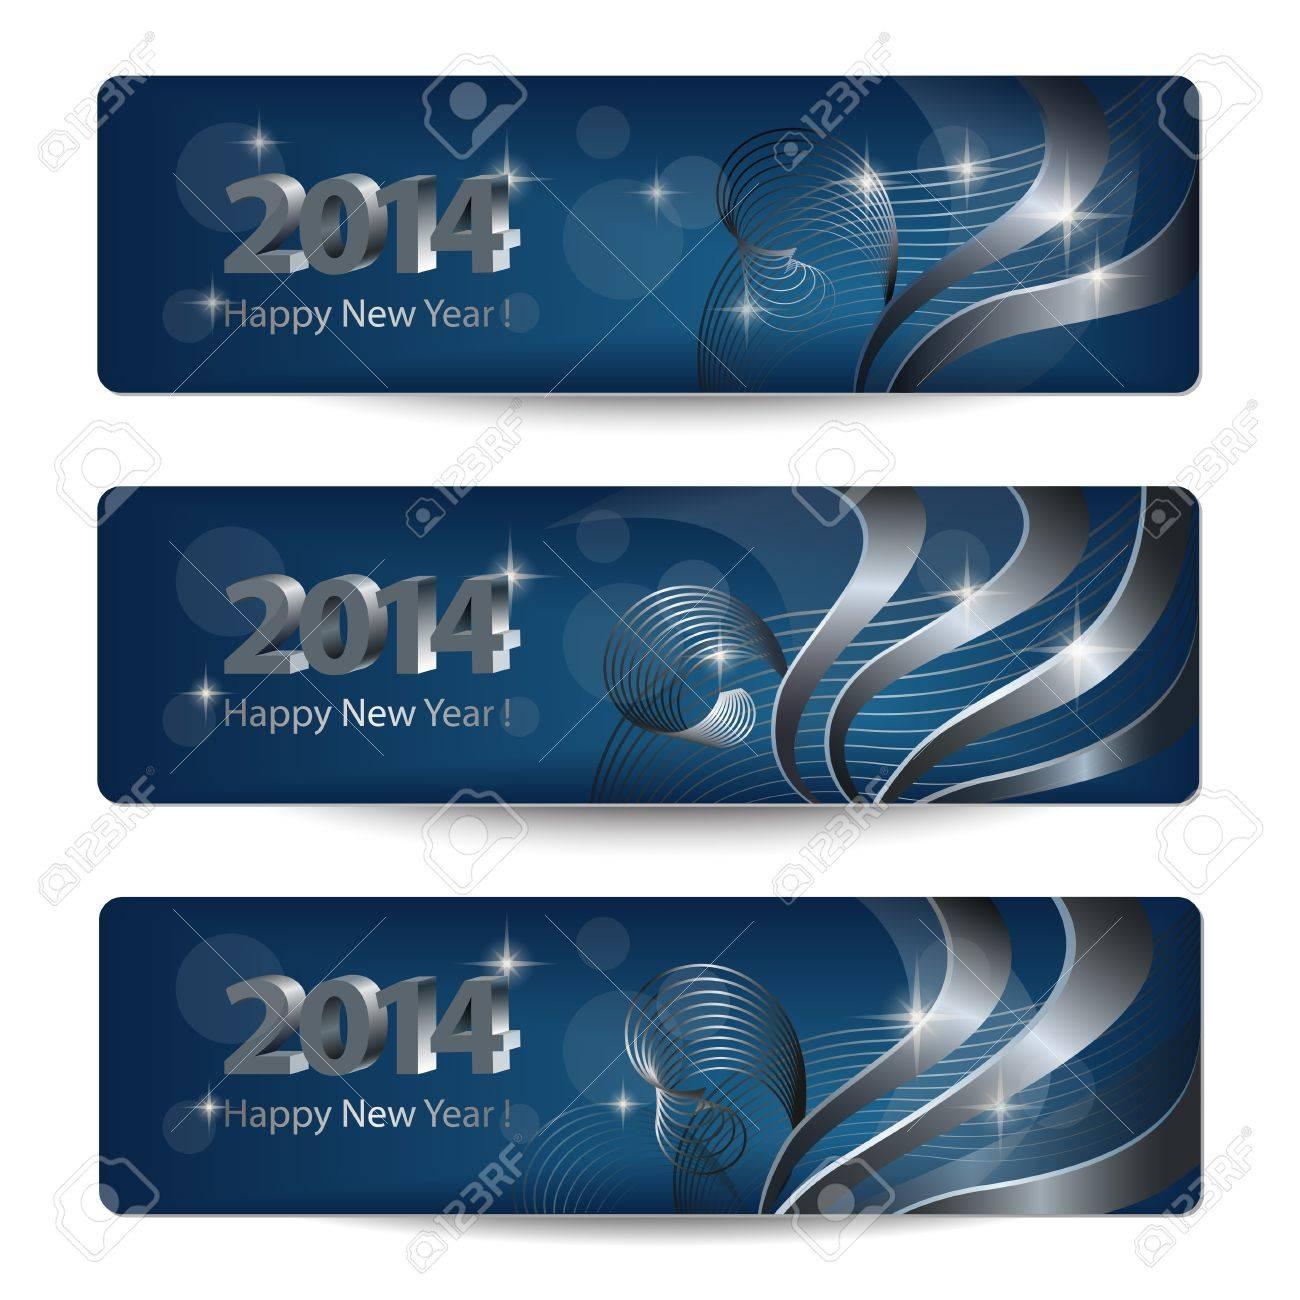 2014 New Year vector banners, headers Stock Vector - 19032040